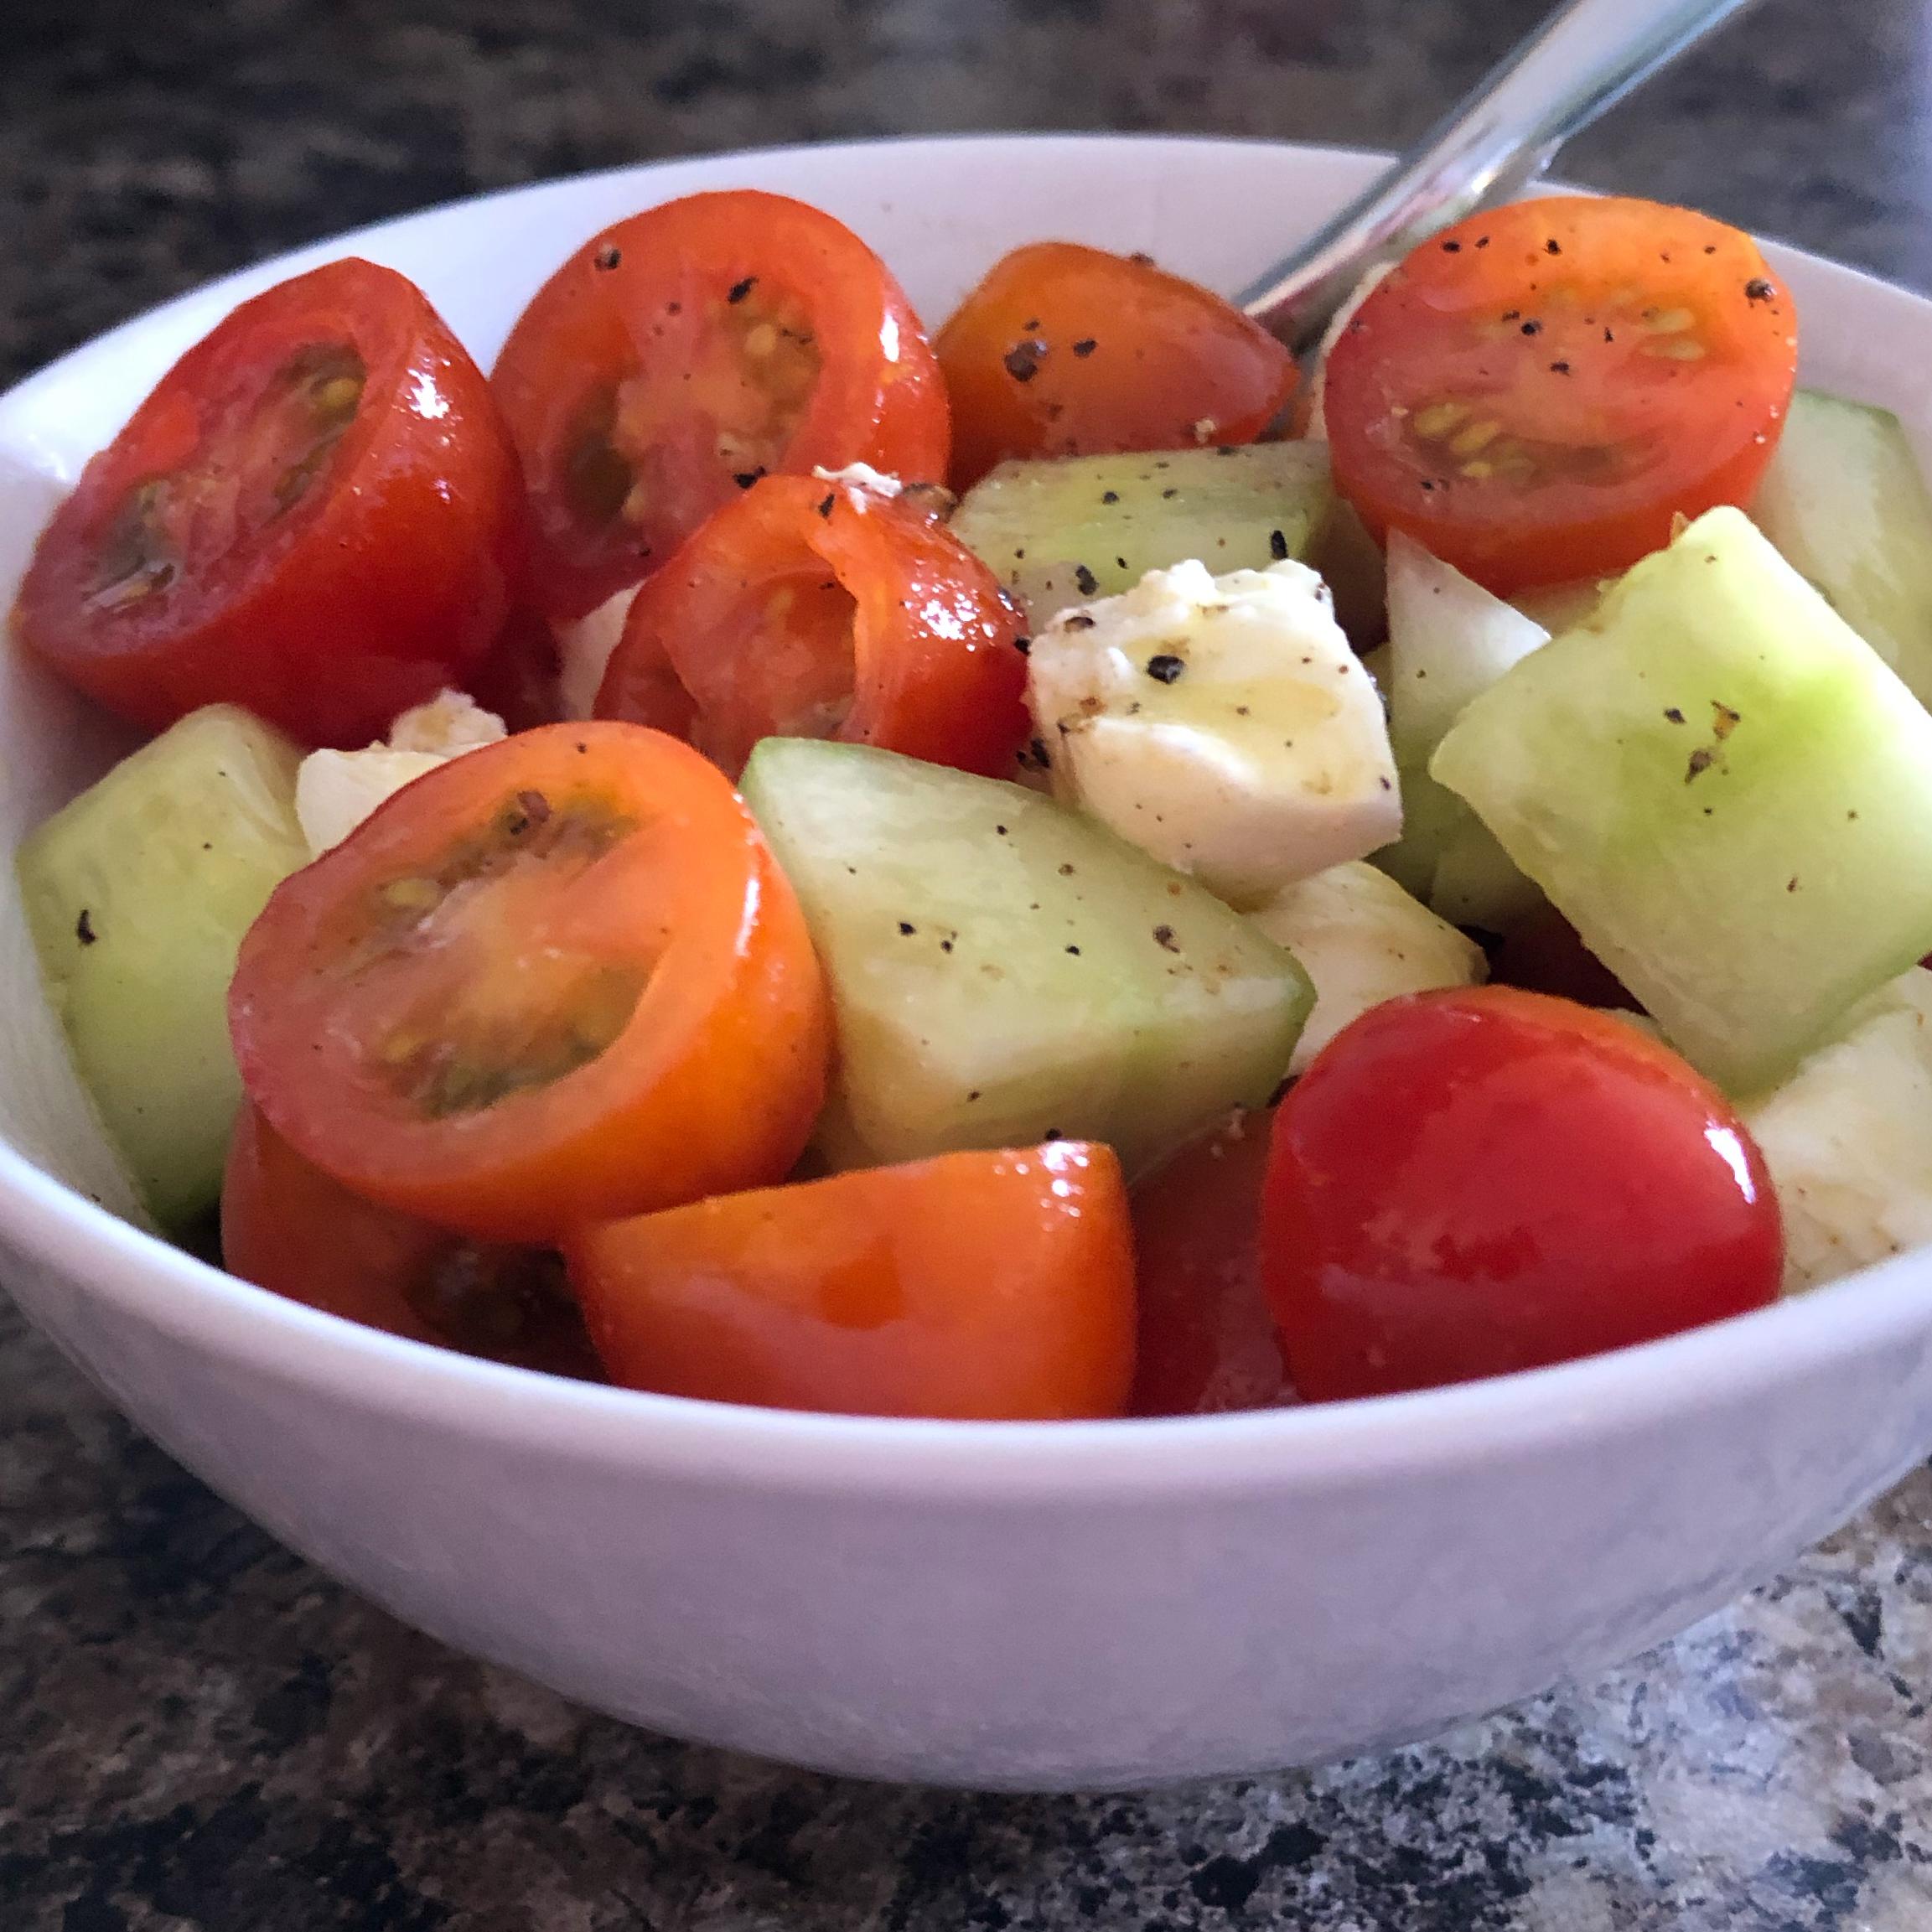 Summertime Tomato Salad cindylouwho